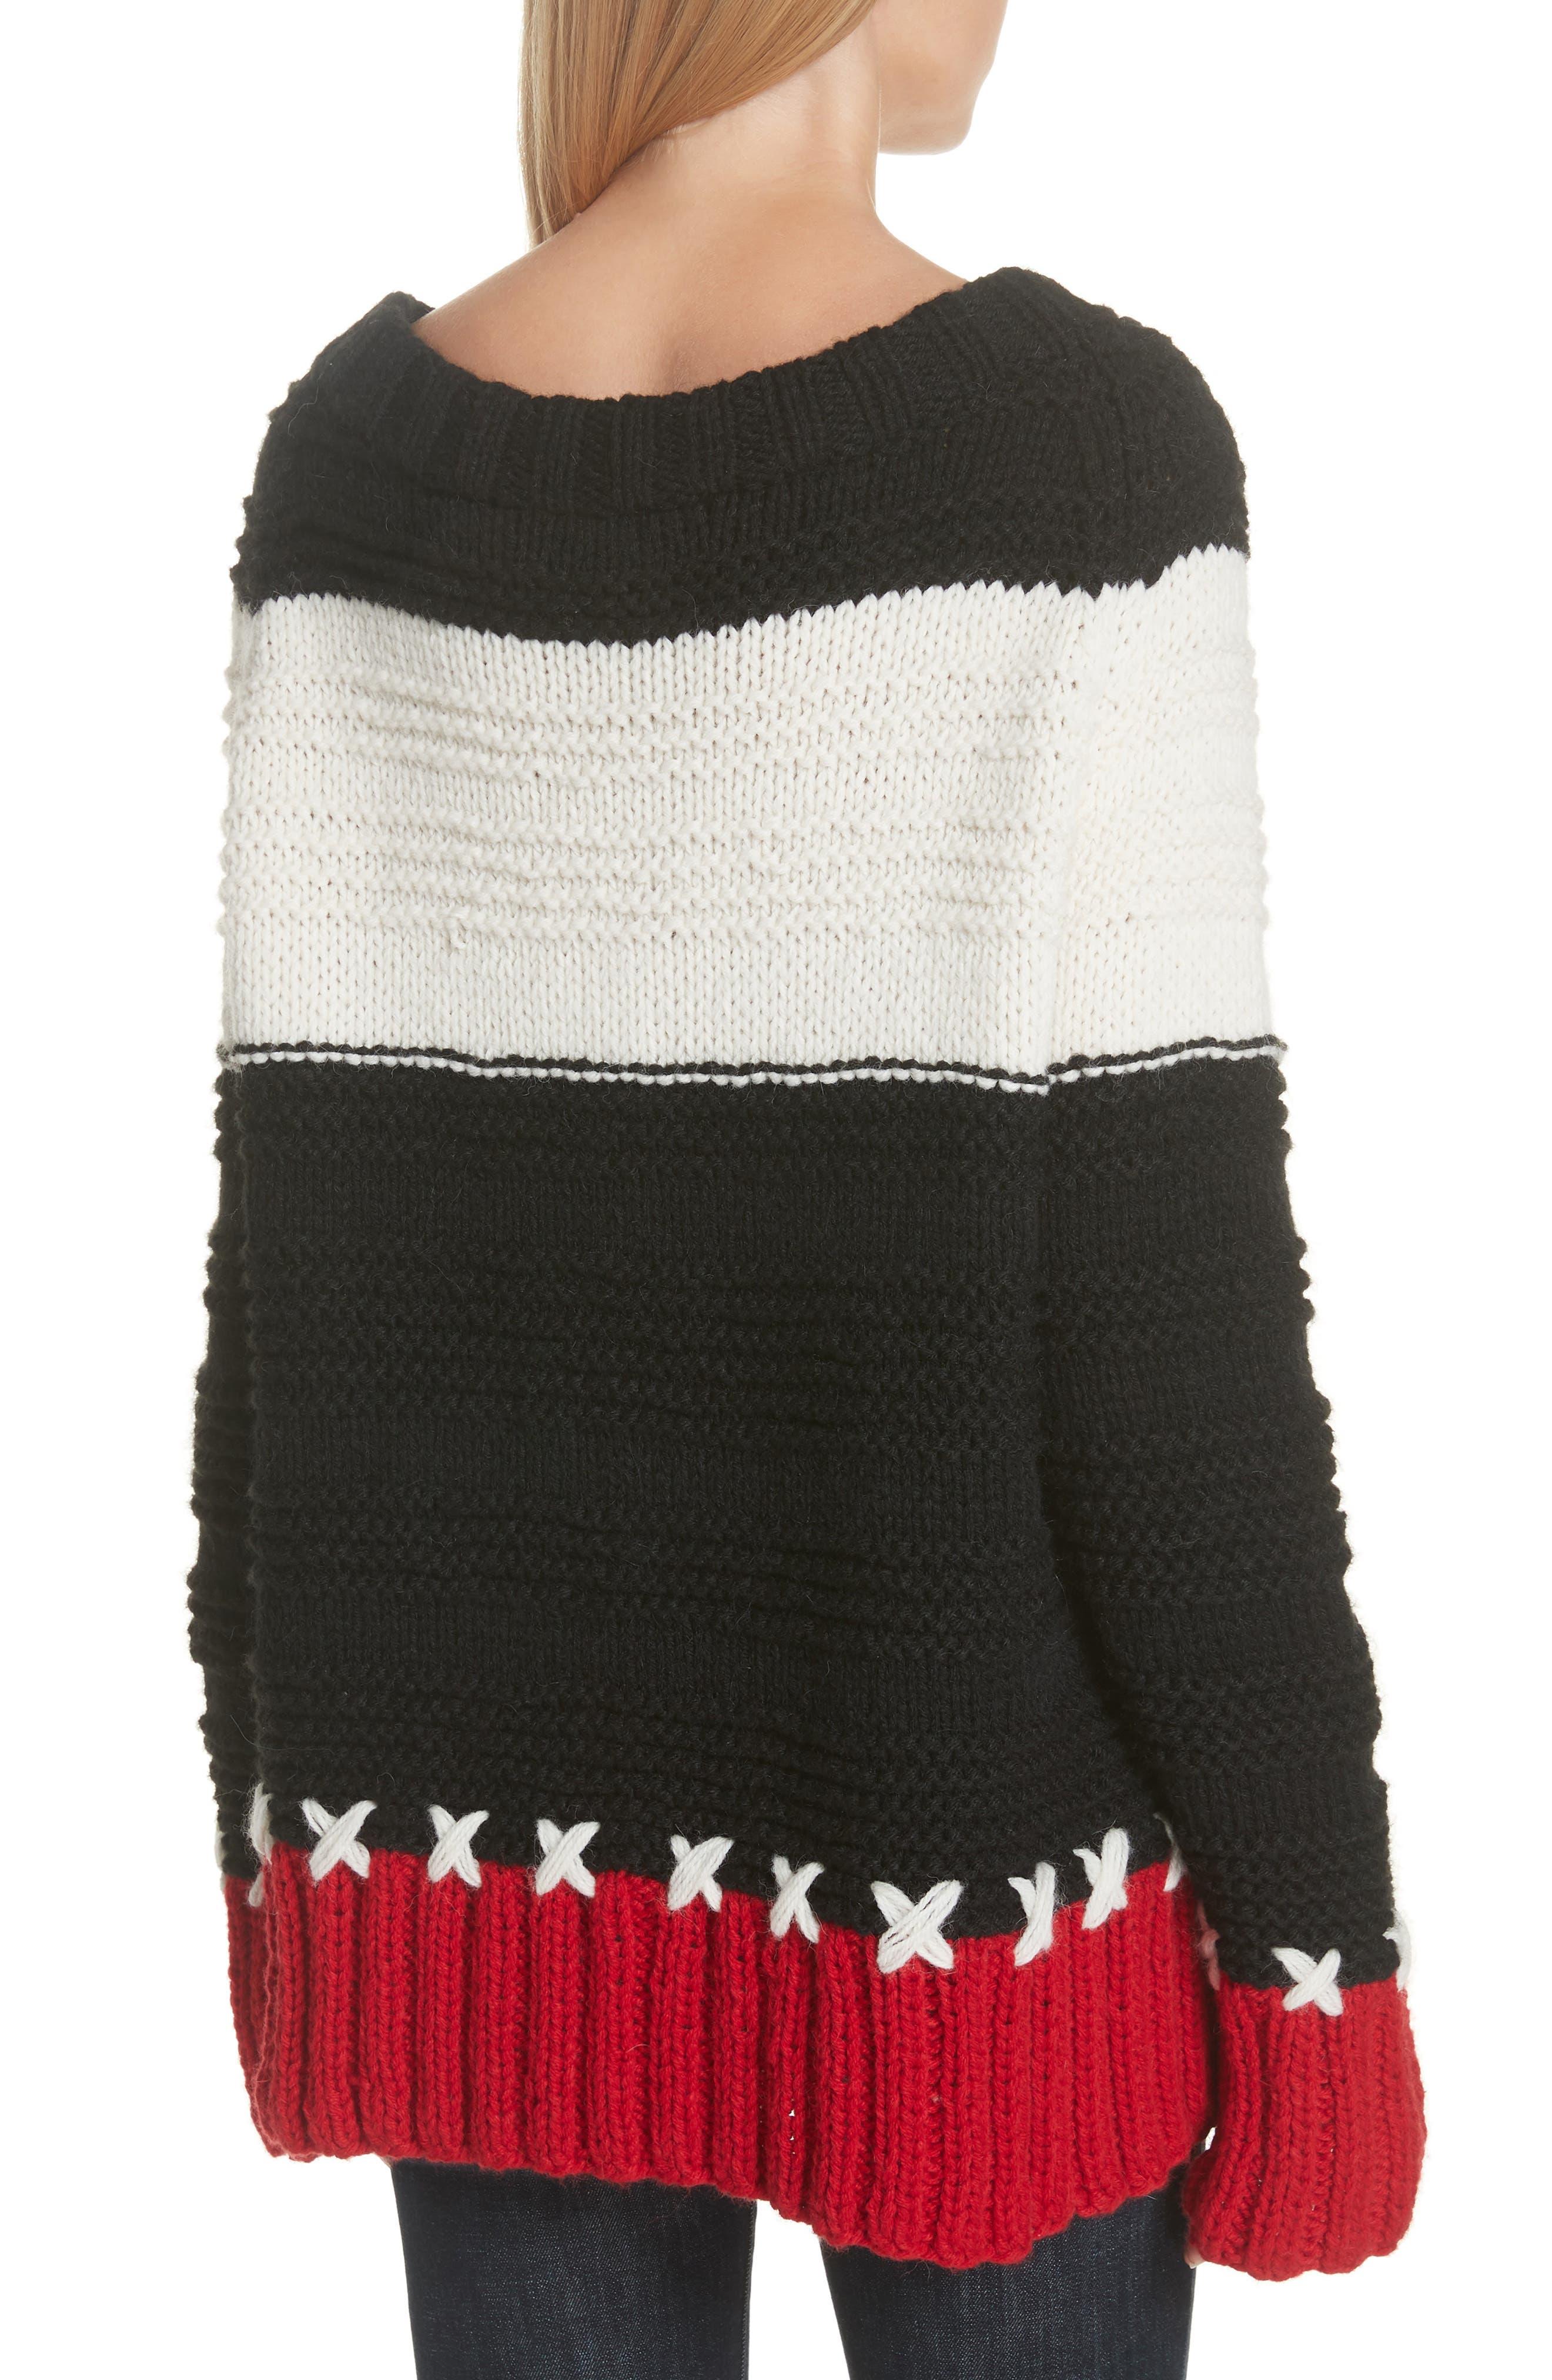 SMYTHE,                             Stripe Cross Stitched Alpaca Blend Sweater,                             Alternate thumbnail 2, color,                             001